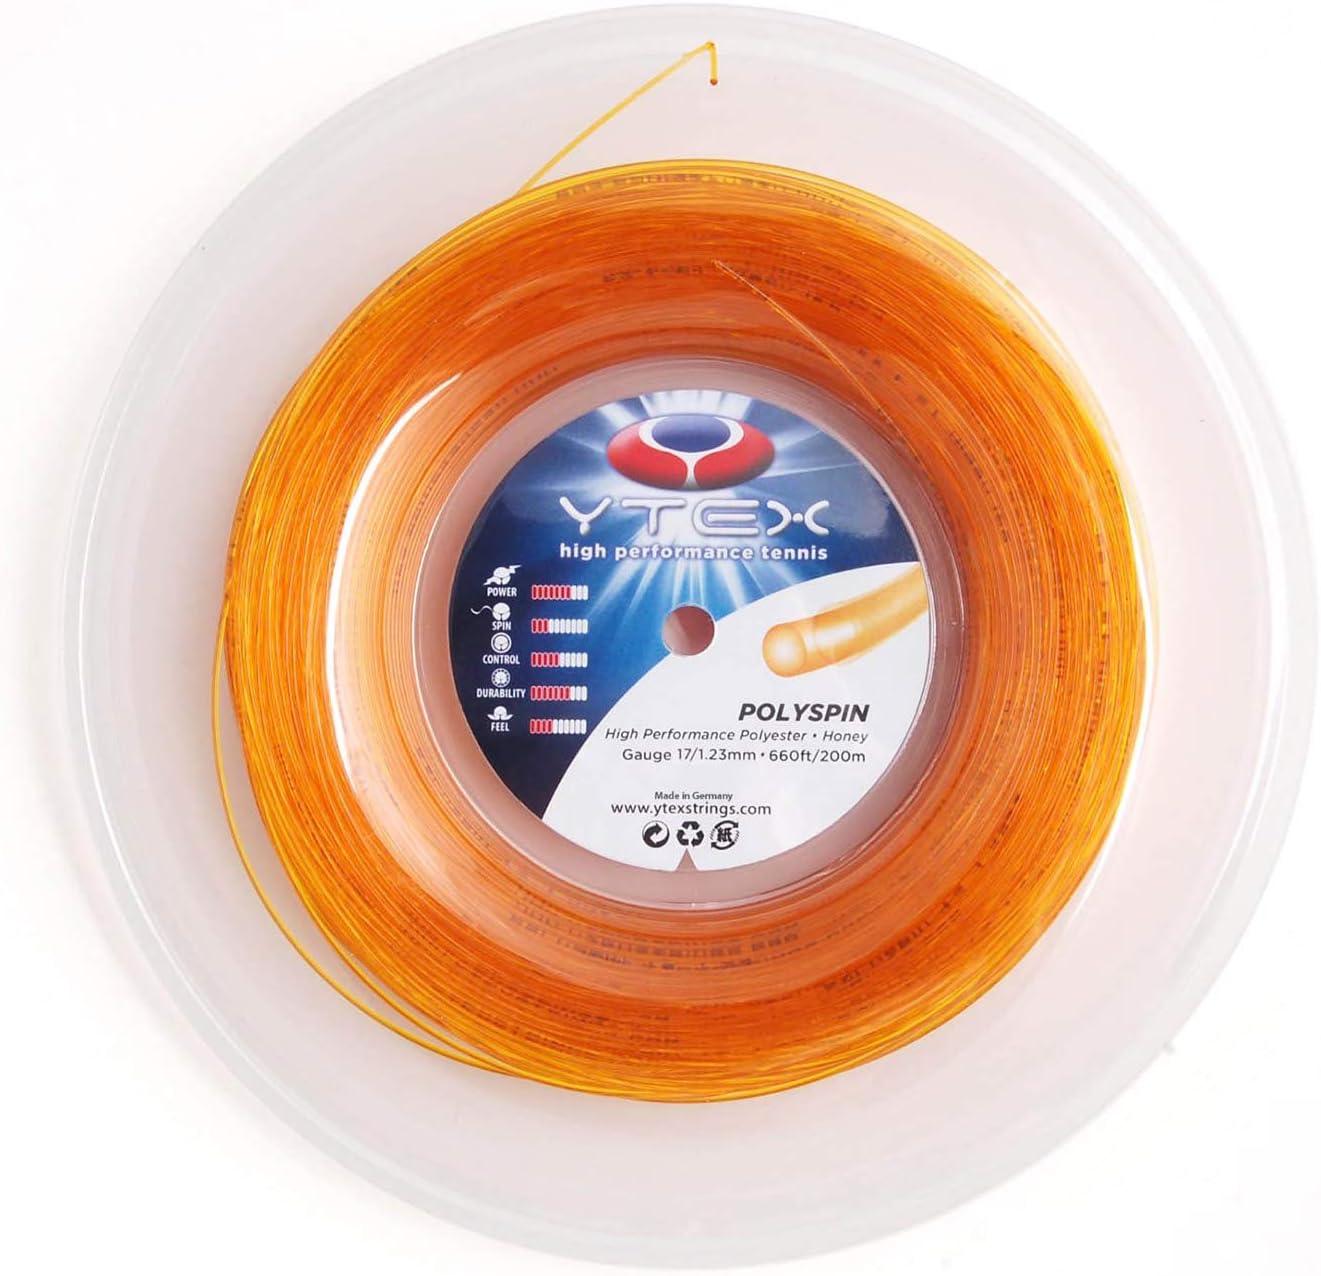 YTEX Polyspin Honey Max 81% OFF Fashionable Tennis Racquet Gauge 17 String 1.23mm